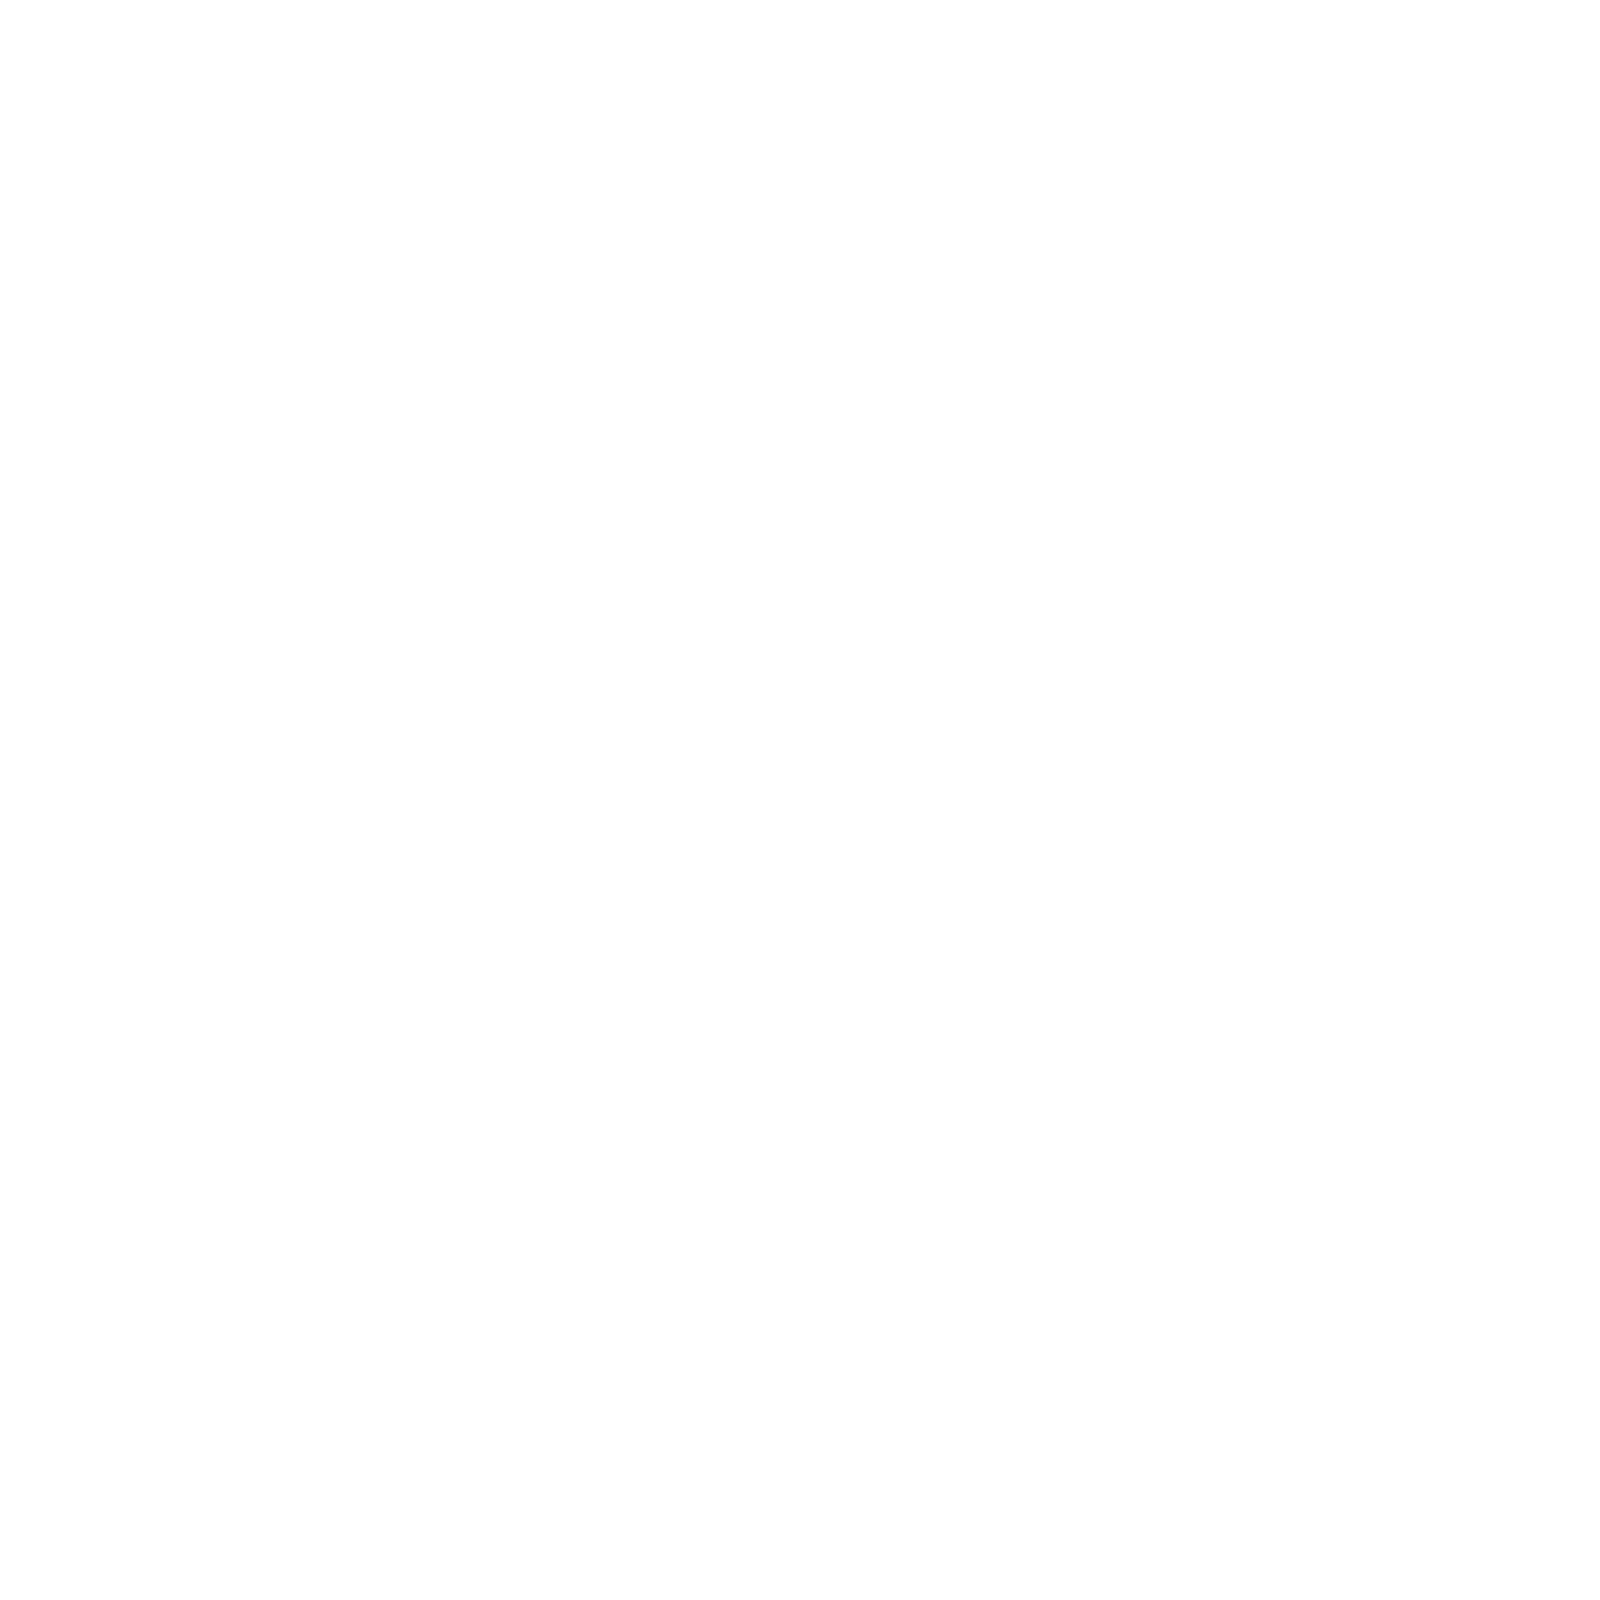 MB-ageas-life-project-logo